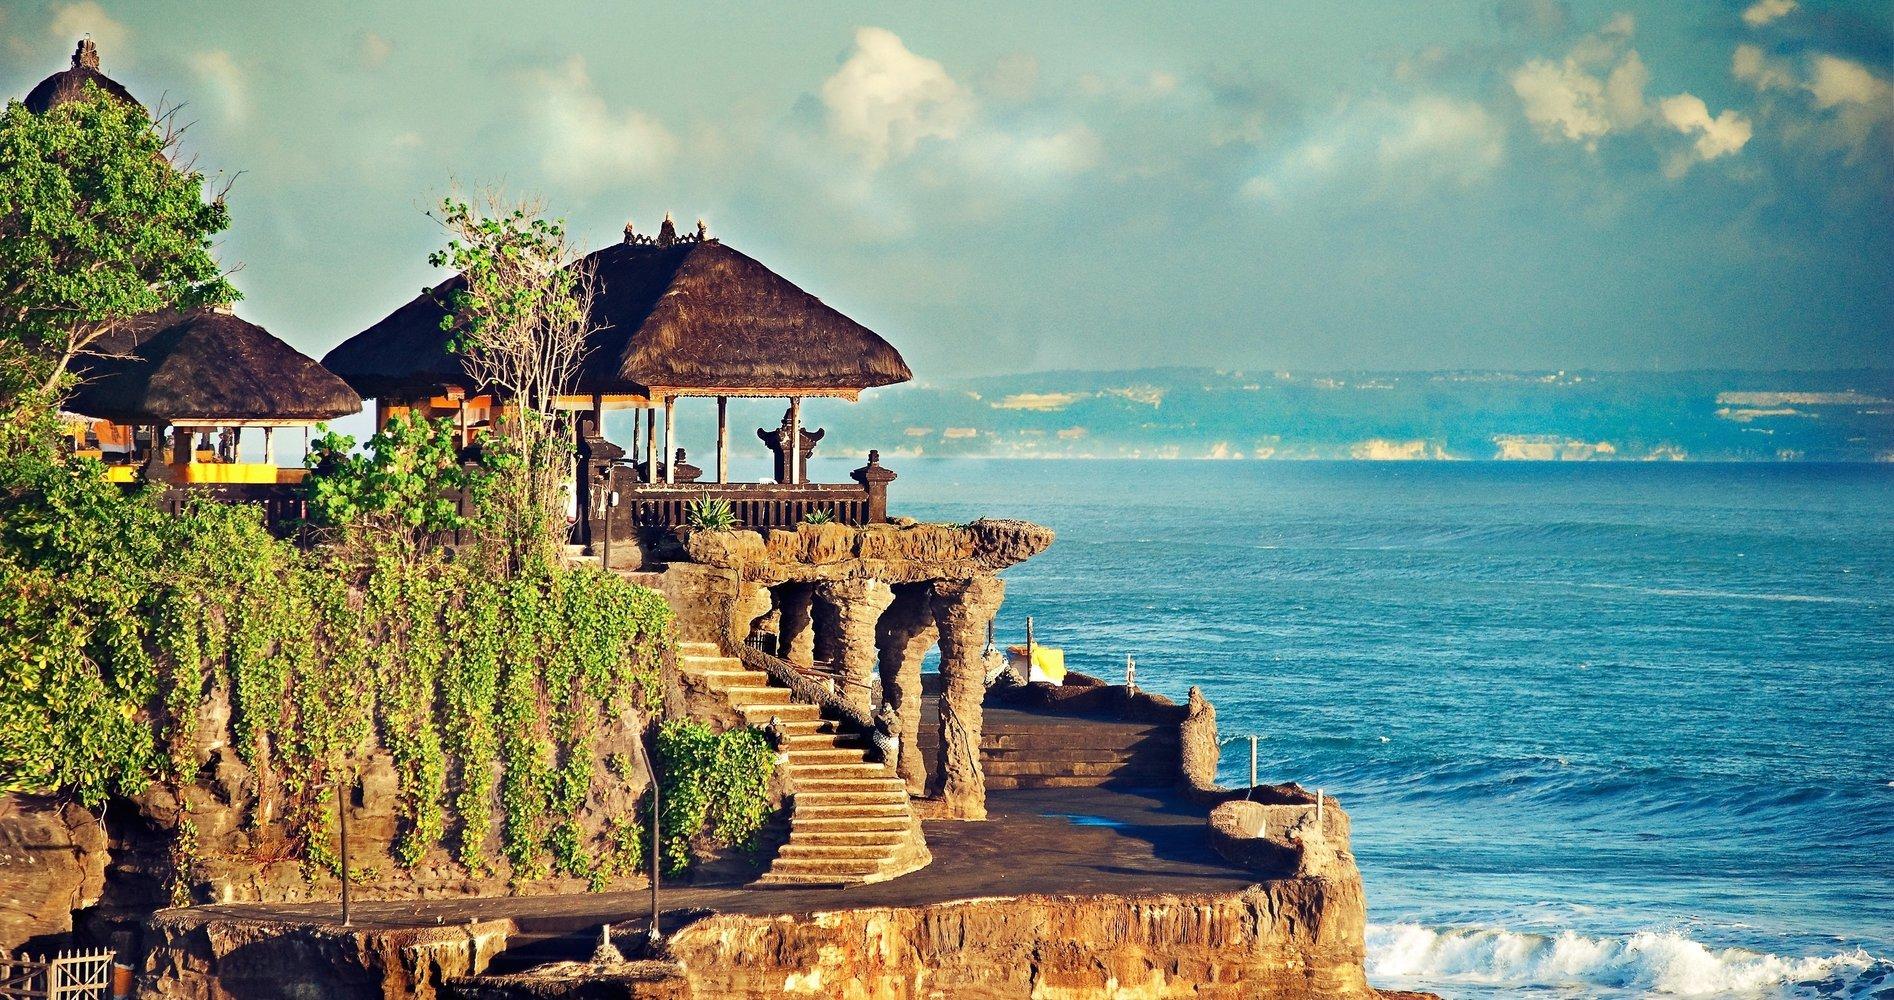 Bali Honeymoon Package Suntravs Travel Management